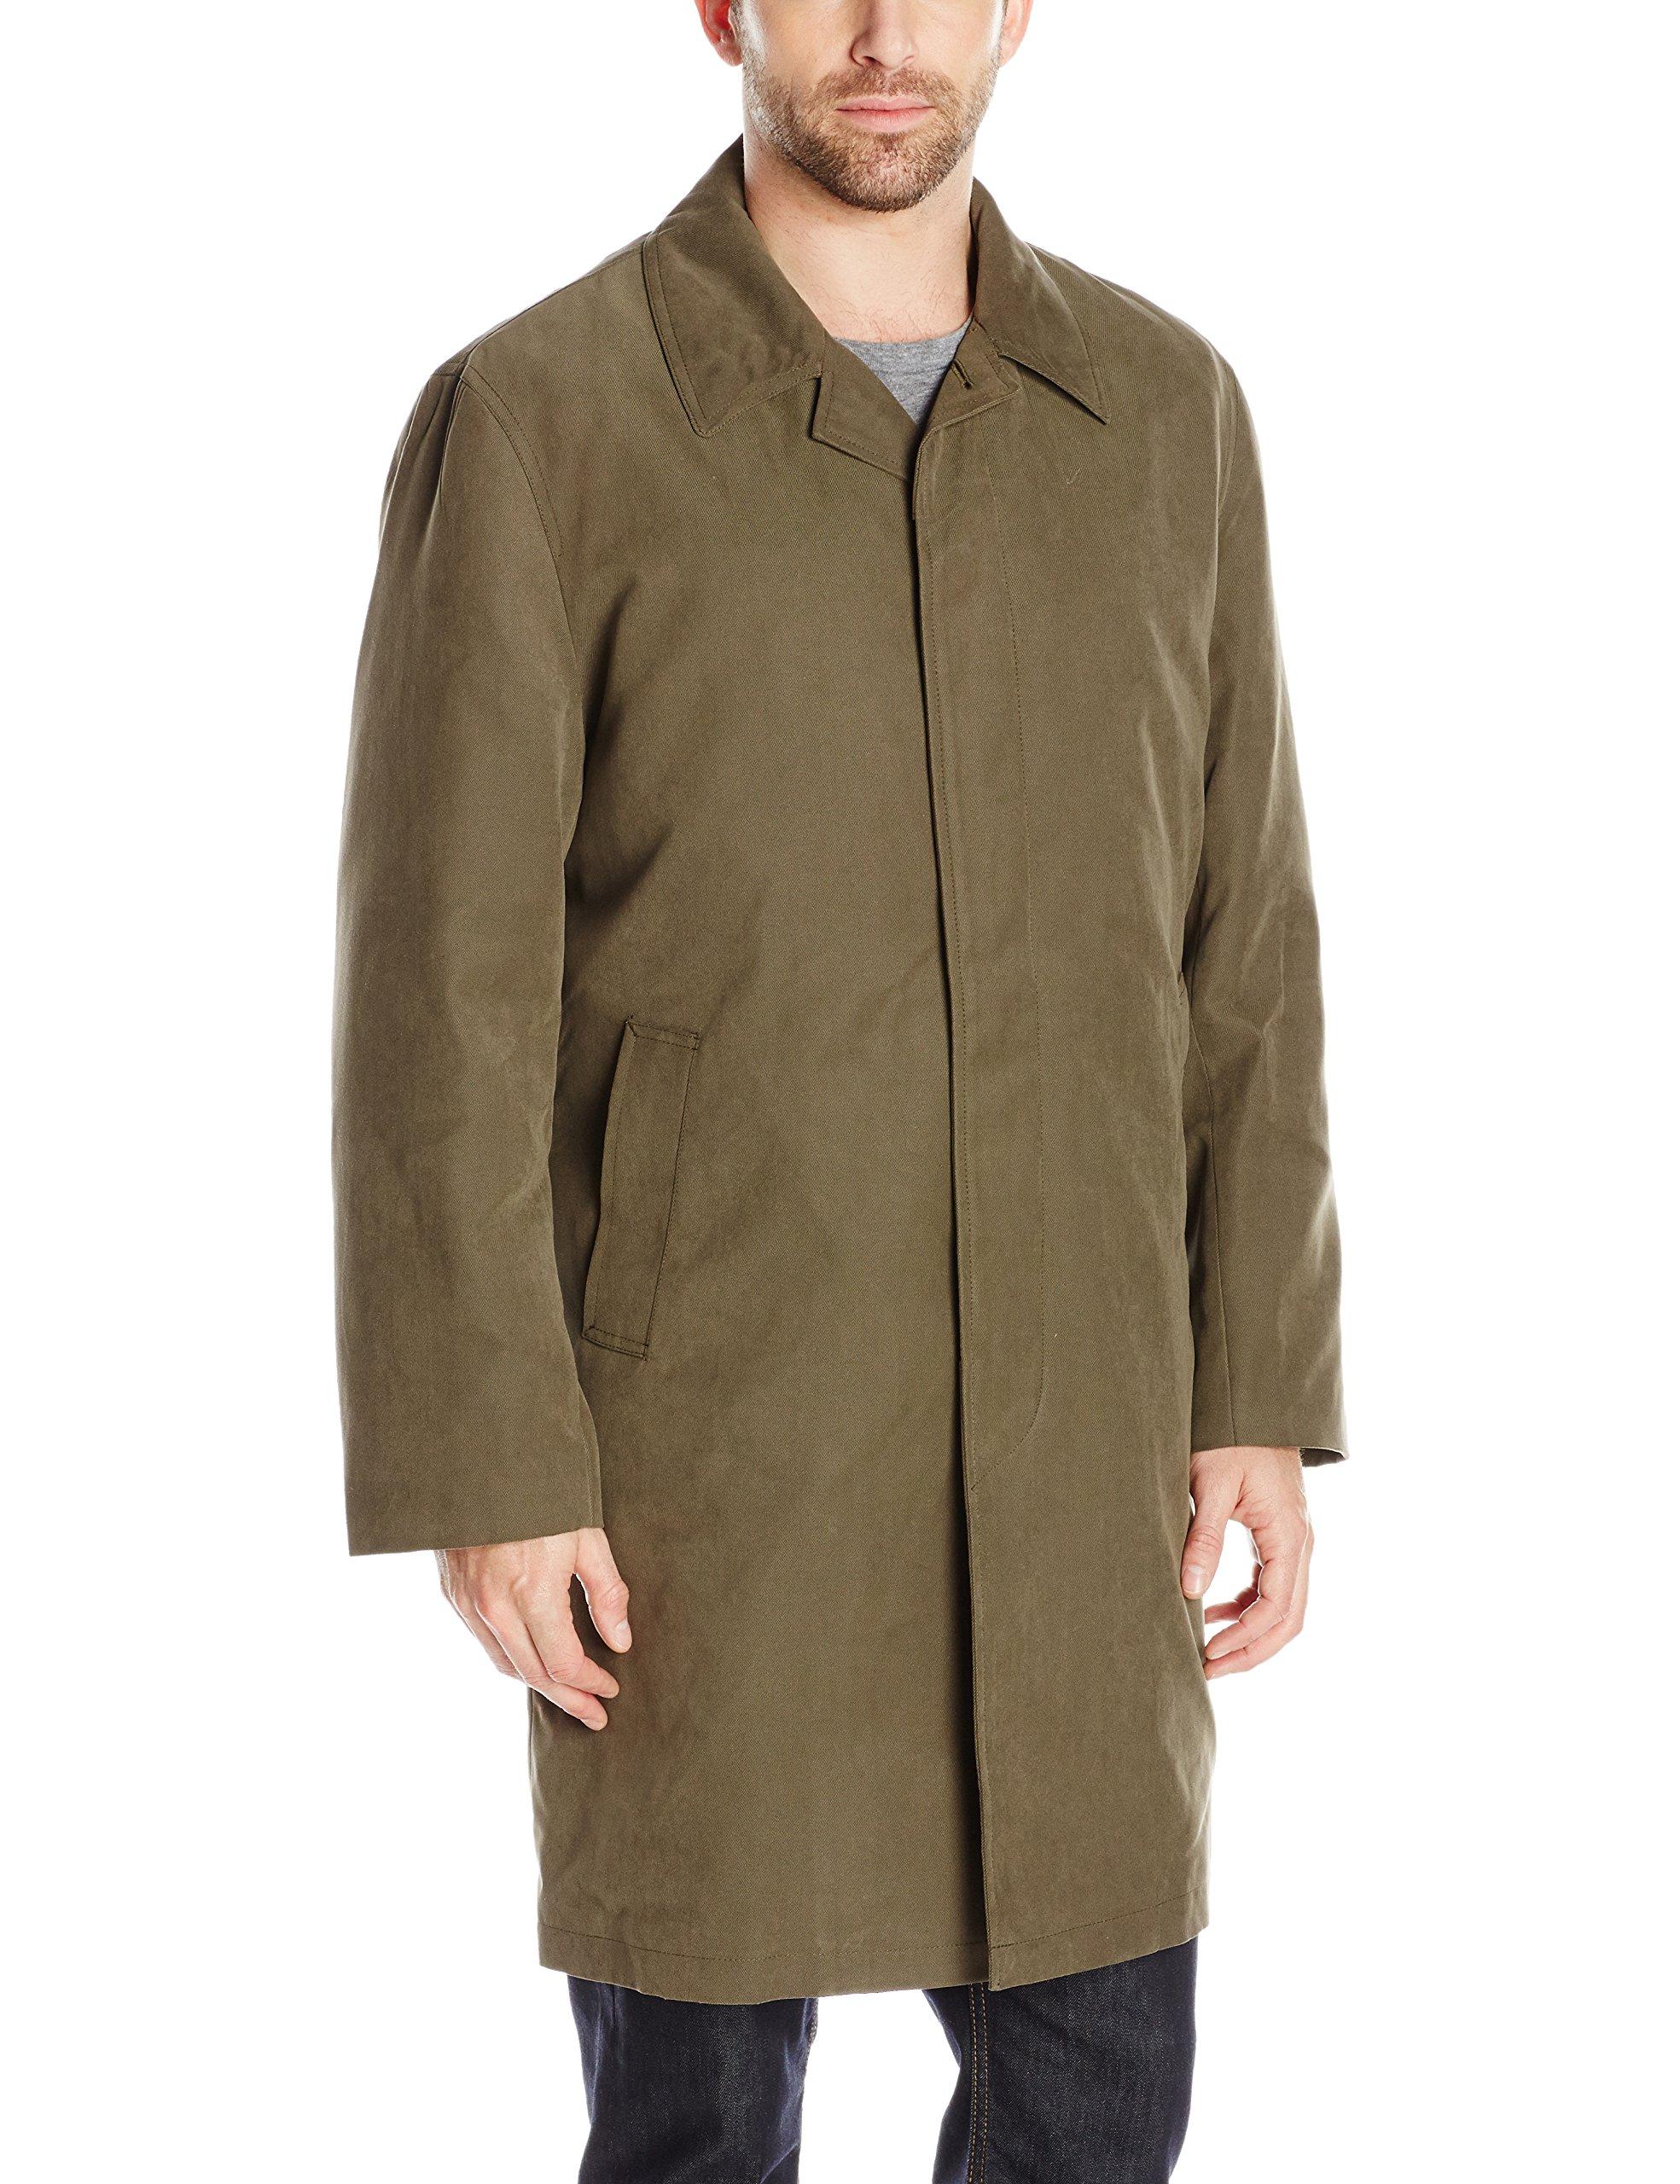 London Fog Men's Durham Rain Coat With Zip-Out Body, Covert, 40 Short